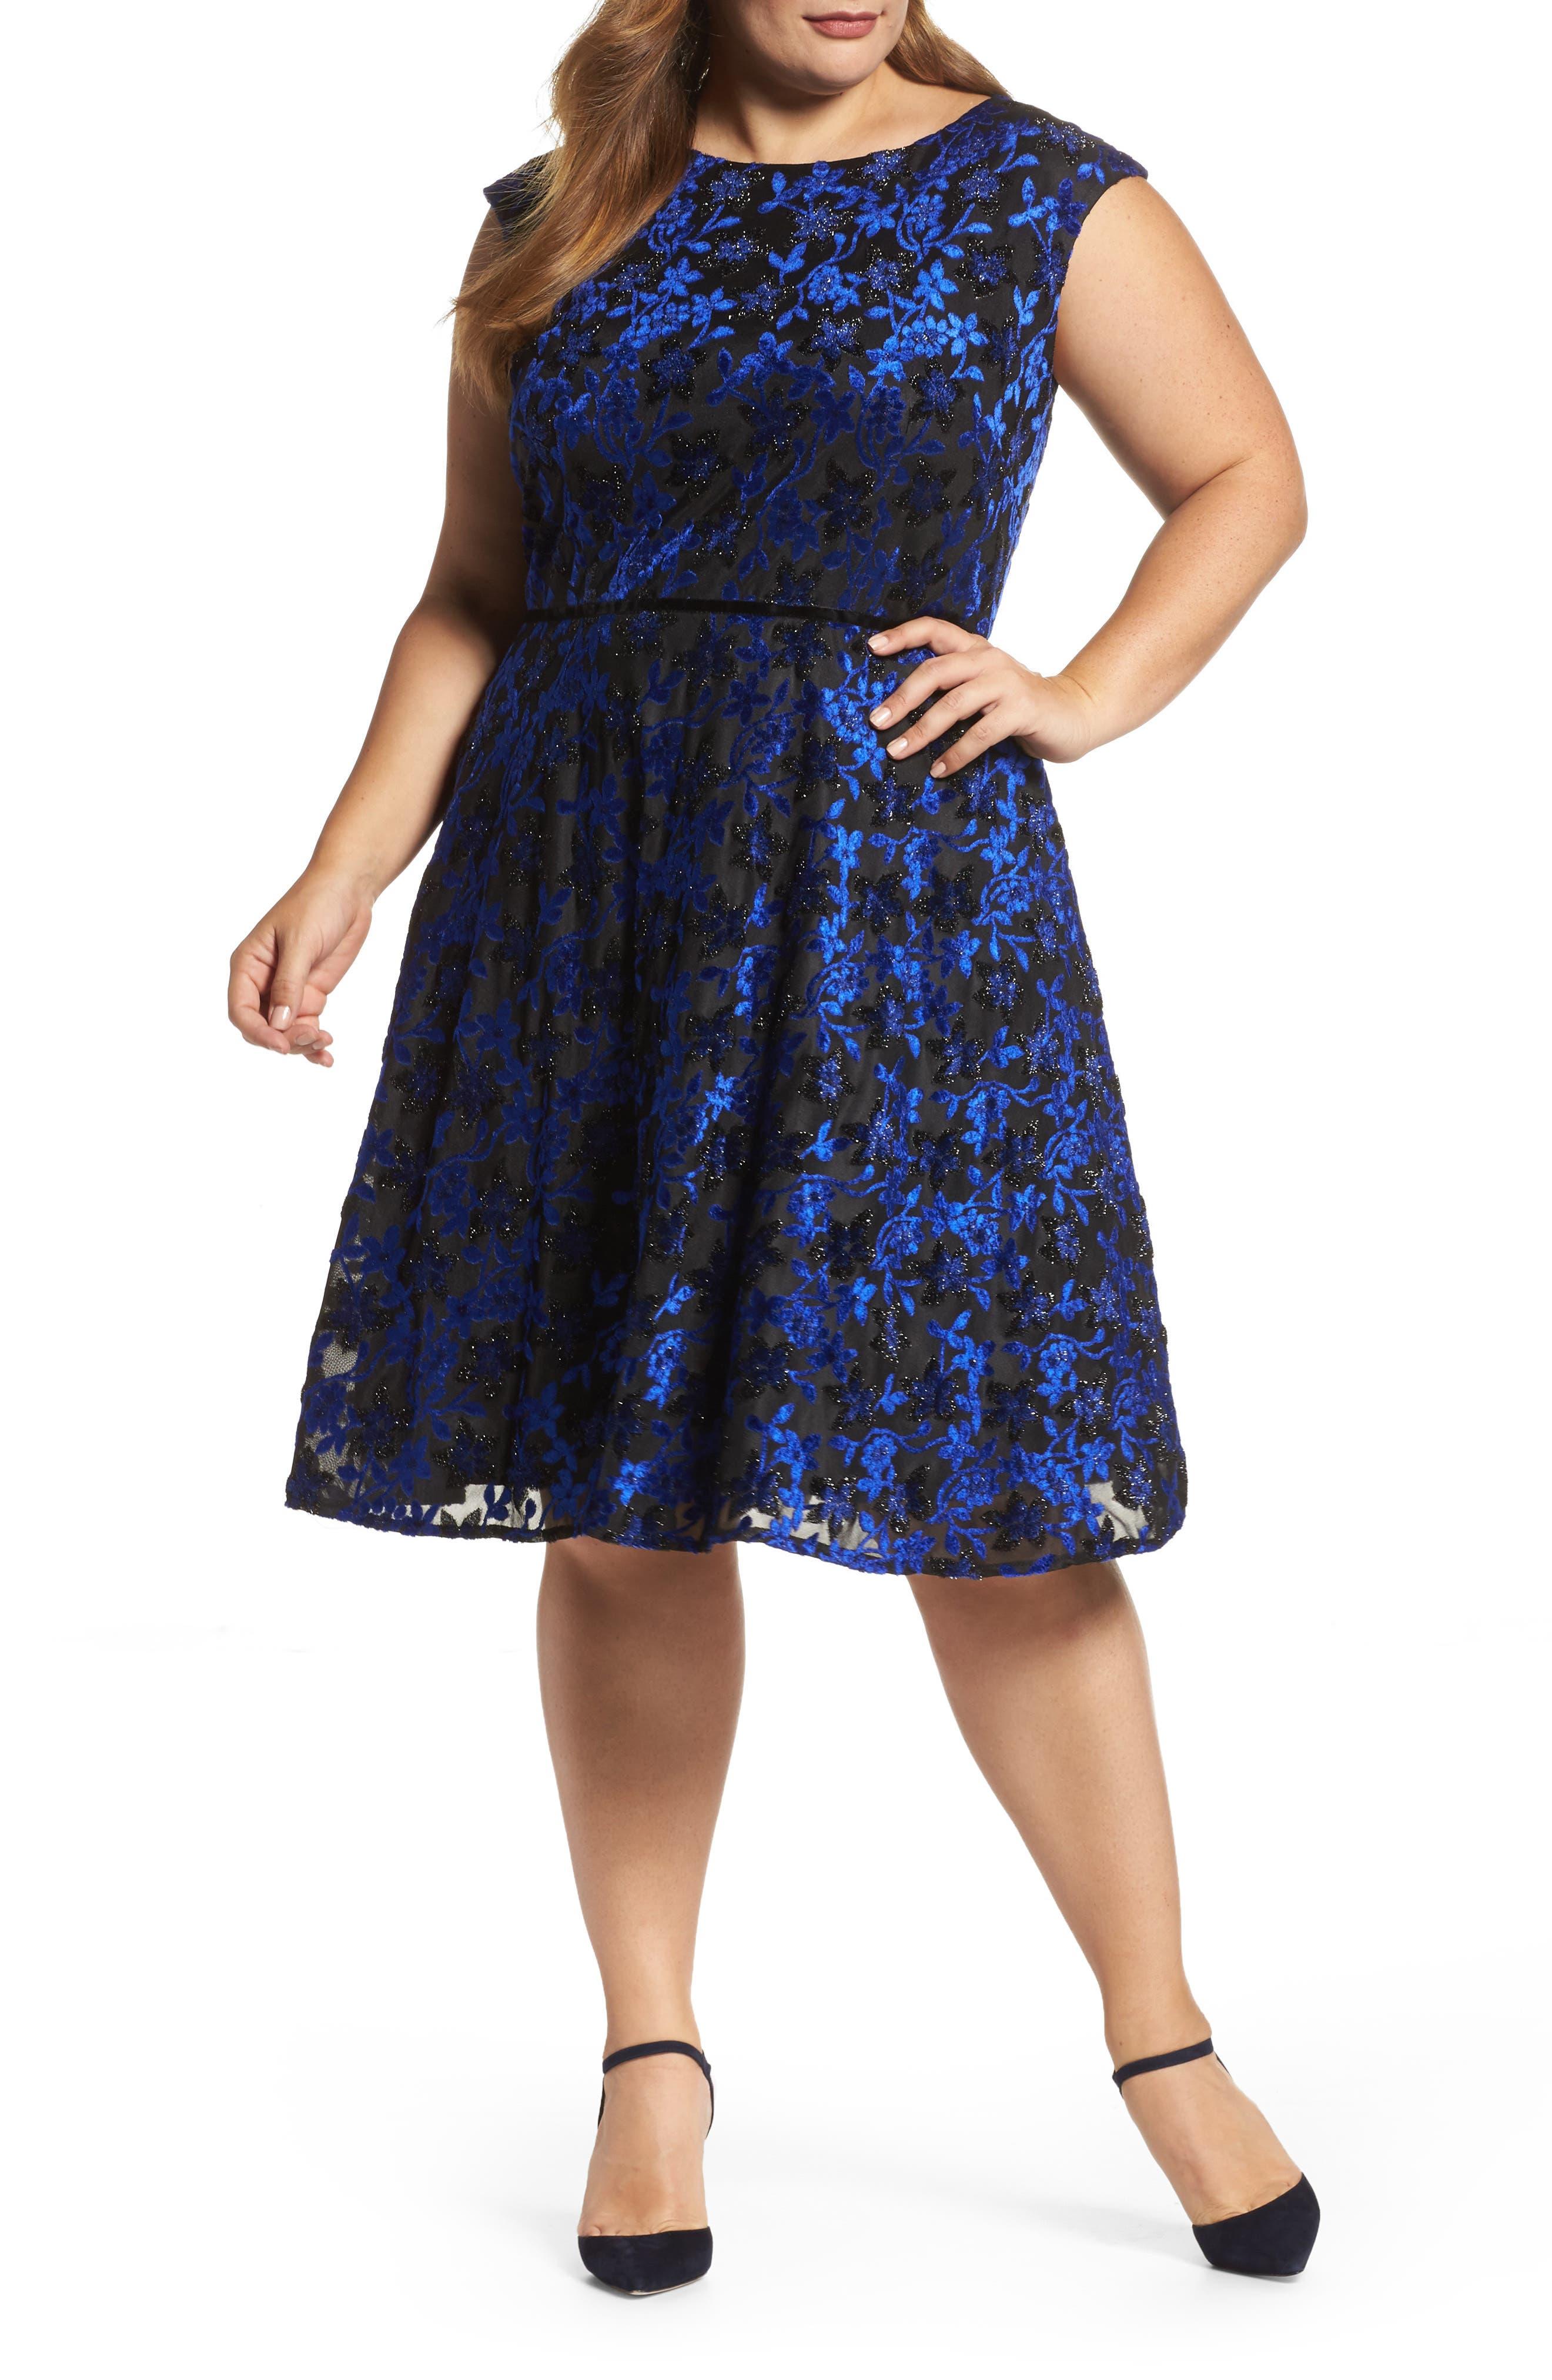 Alternate Image 1 Selected - Tahari Burnout Velvet Fit & Flare Dress (Plus Size)